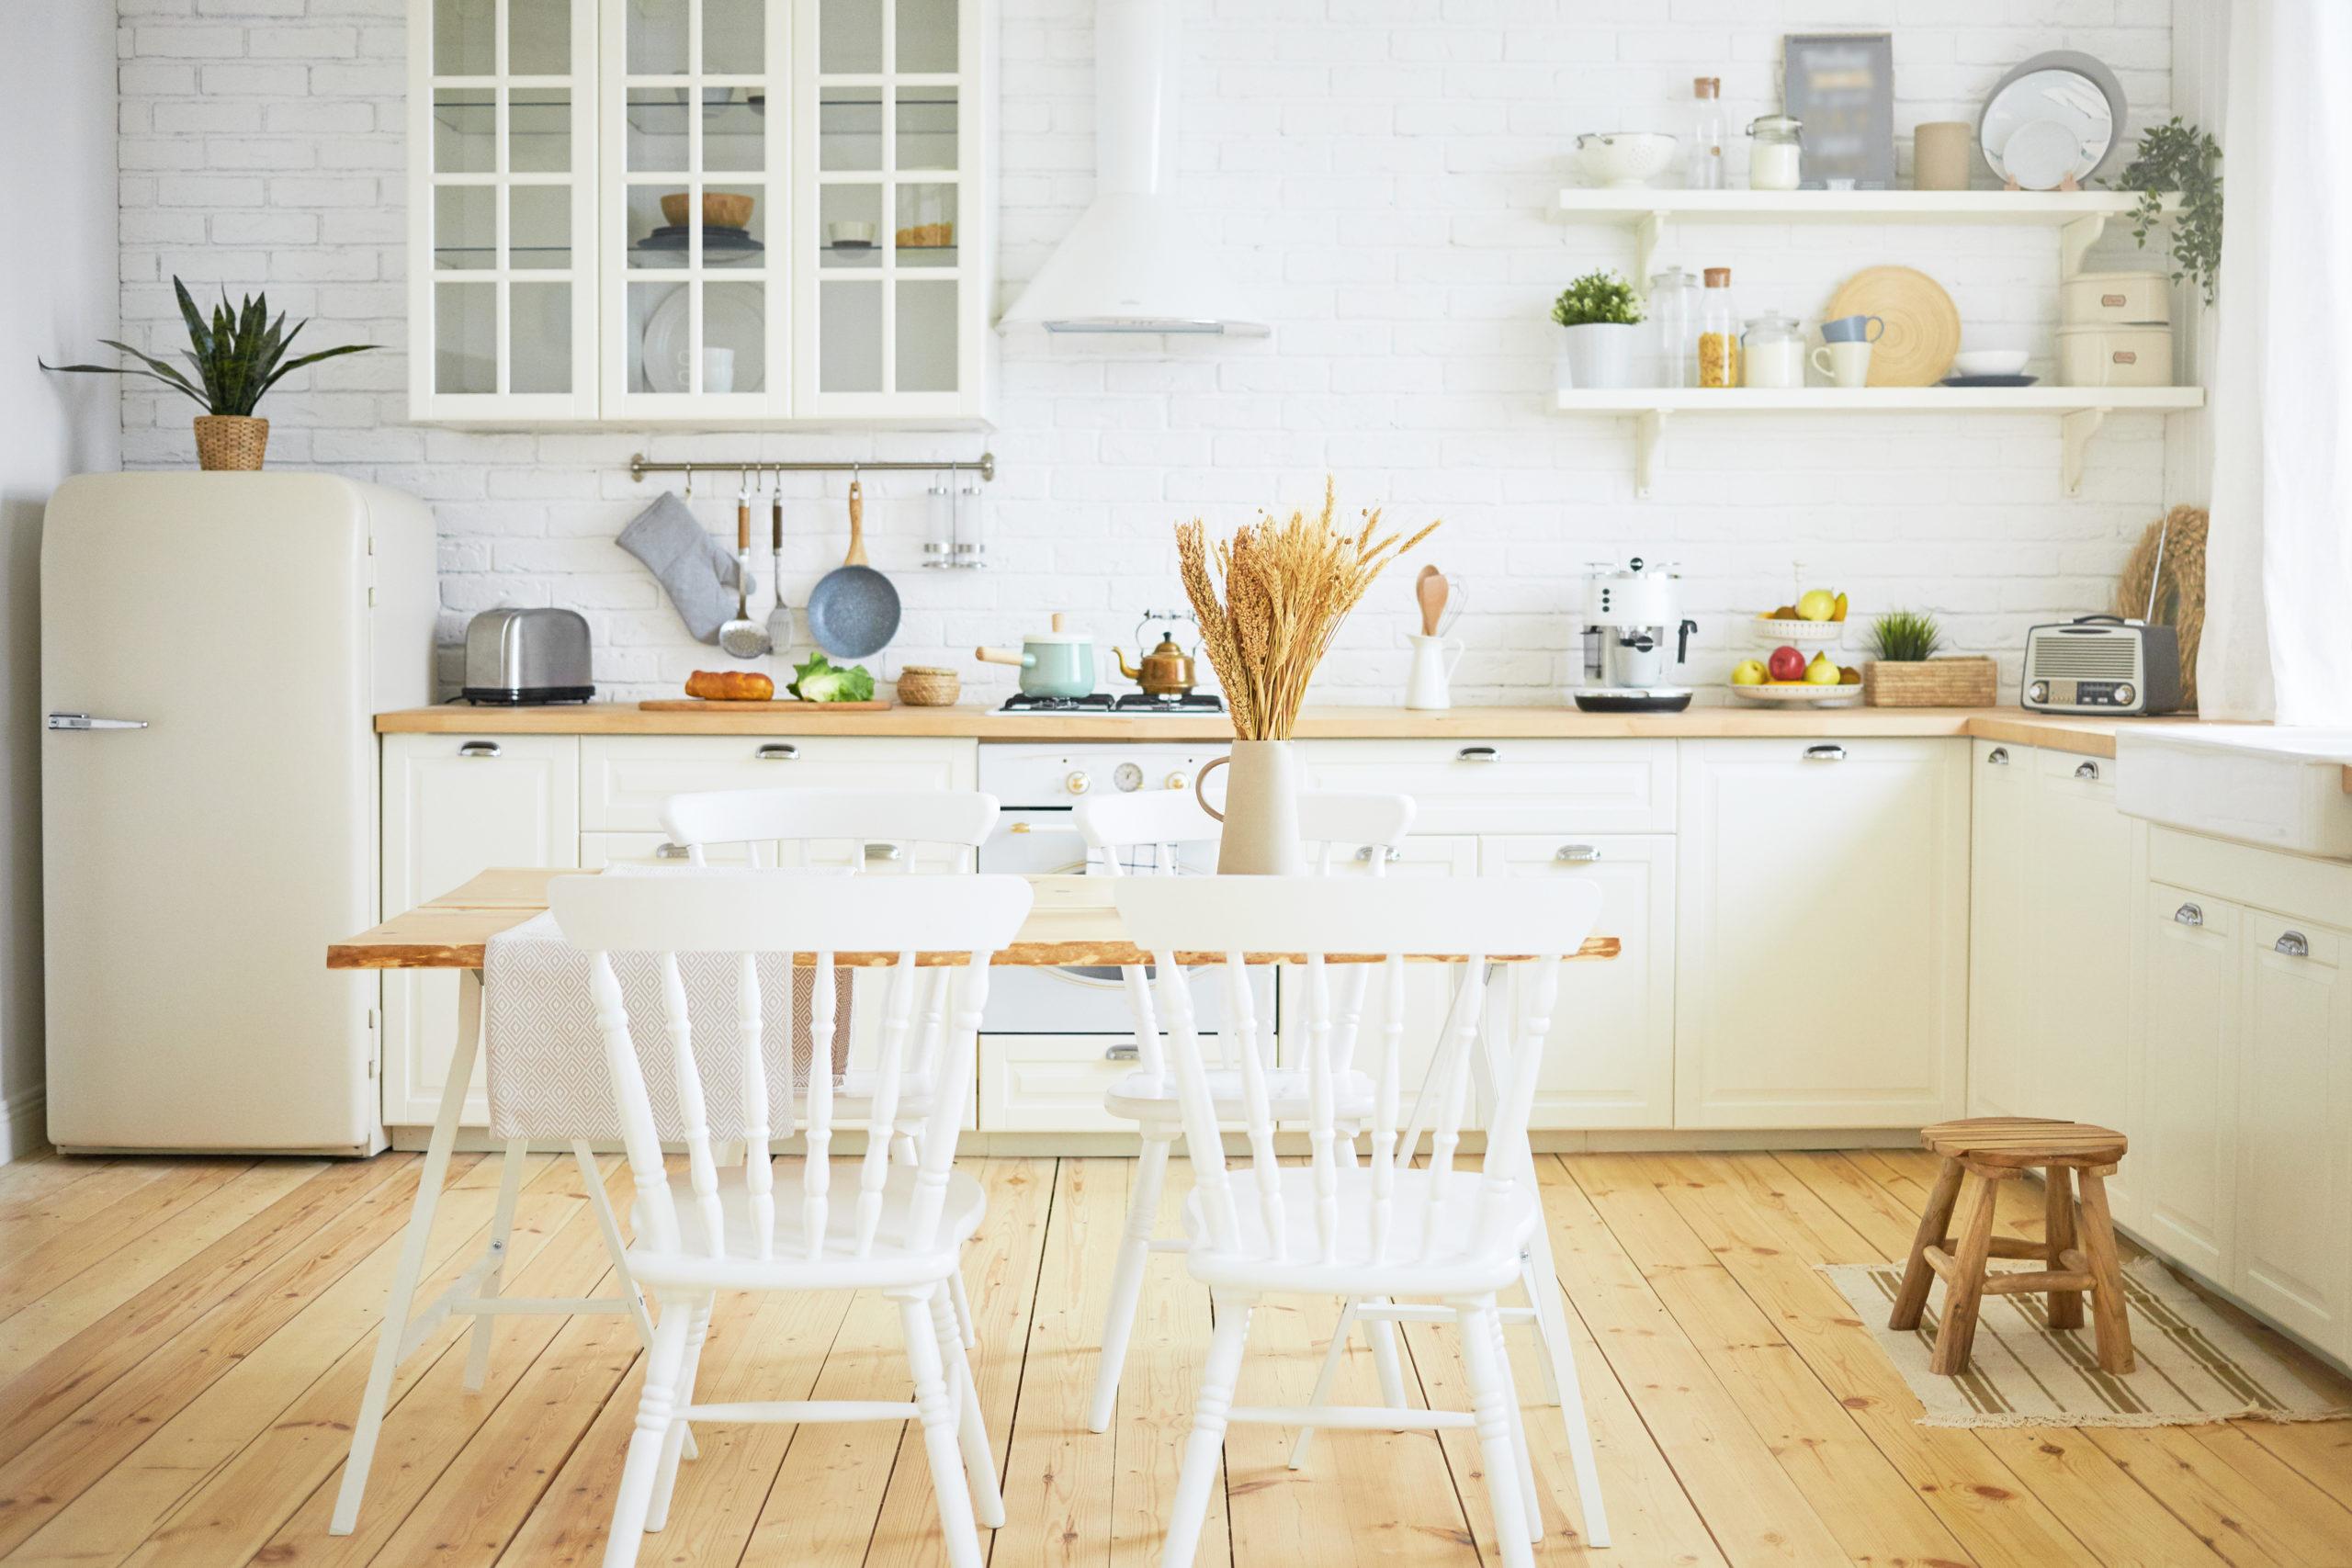 Estante-na-cozinha-ou-na-sala-de-jantar-para-expor-loucas